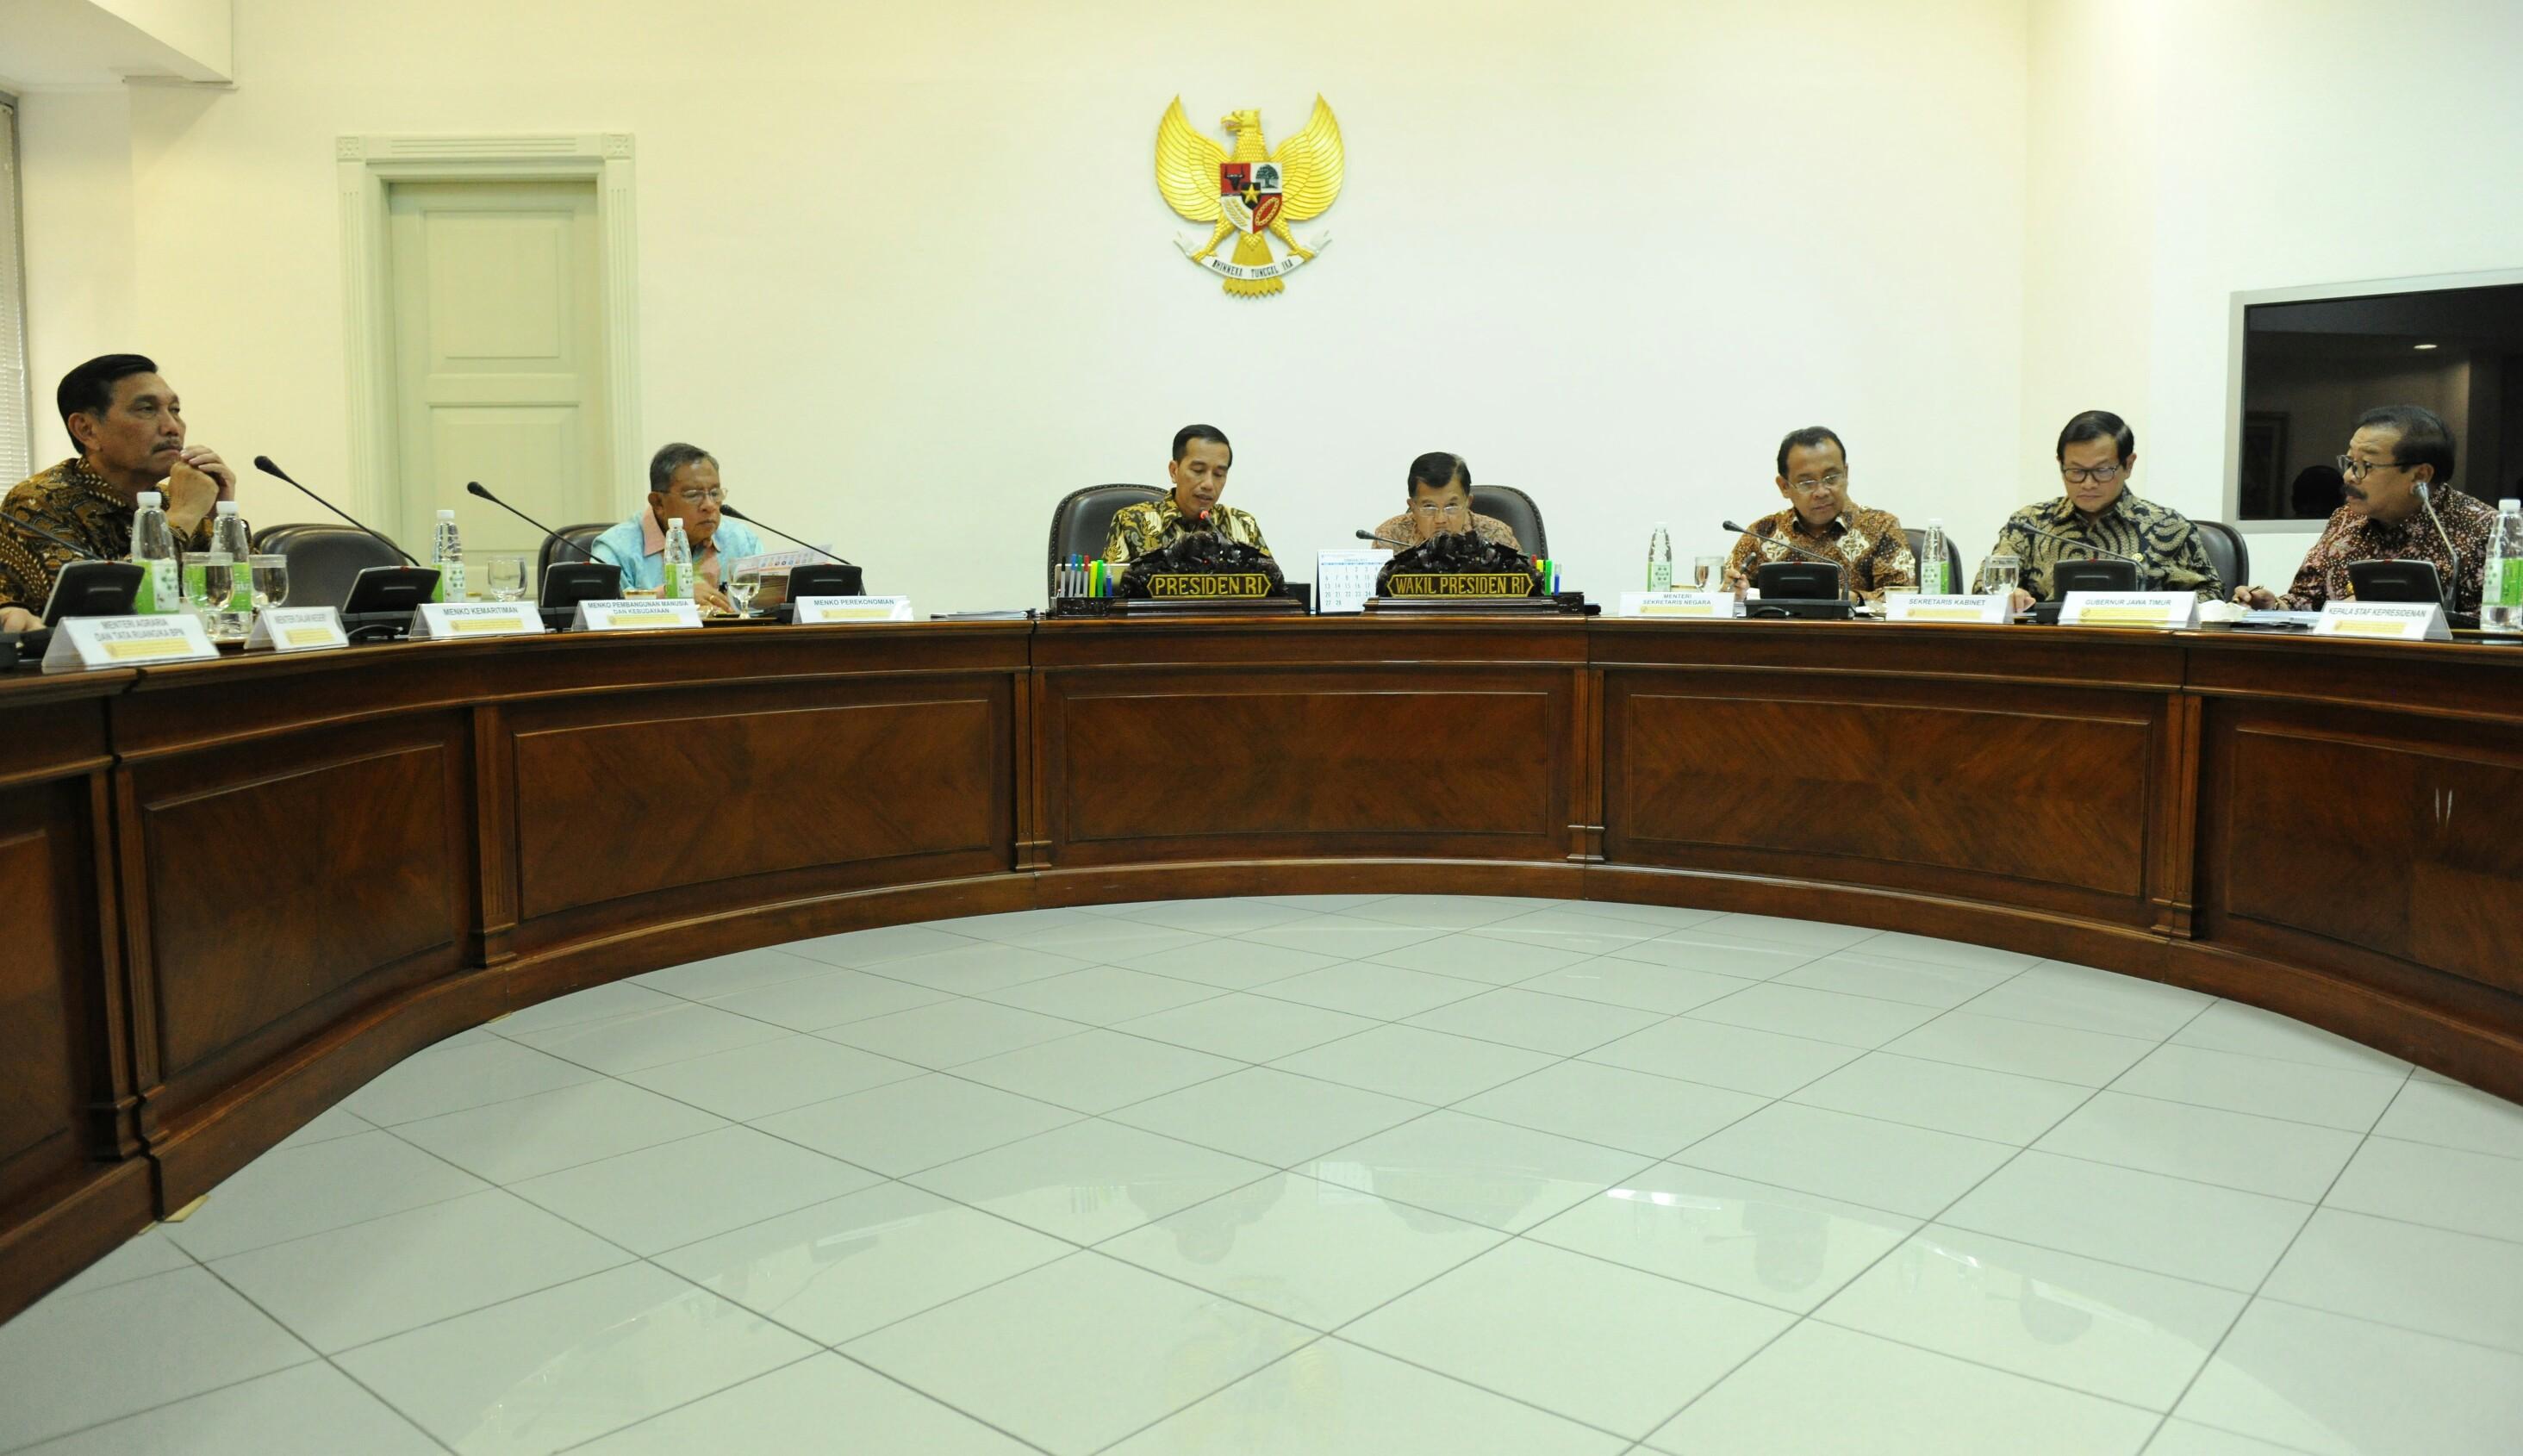 Gubernur Jatim Soekarwo (paling kiri) mengikuti rapat terbatas tentang Jawa Timur, yang dipimpin oleh Presiden Jokowi, di Kantor Presiden, Jakarta, Selasa (14/3) sore. (Foto: Rahmat/Humas)